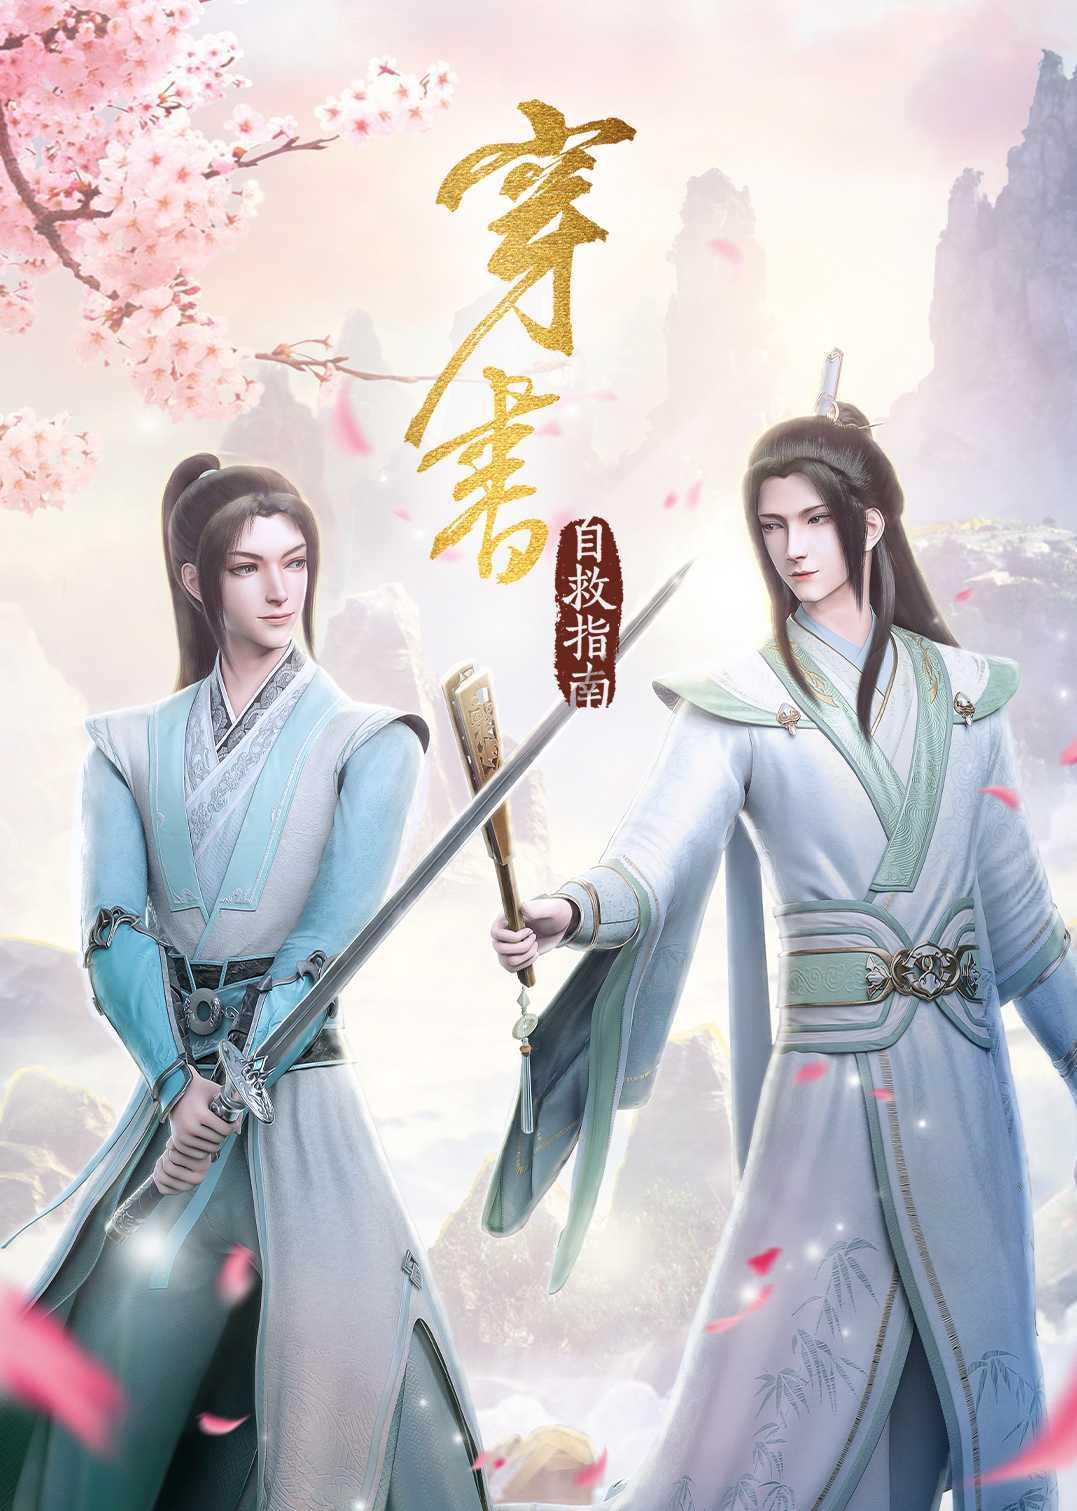 chuan-shu-zijiu-zhinan-ตัวร้ายอย่างข้าจะหนีเอาตัวรอดยังไงดี-ตอนที่-1-9-ซับไทย